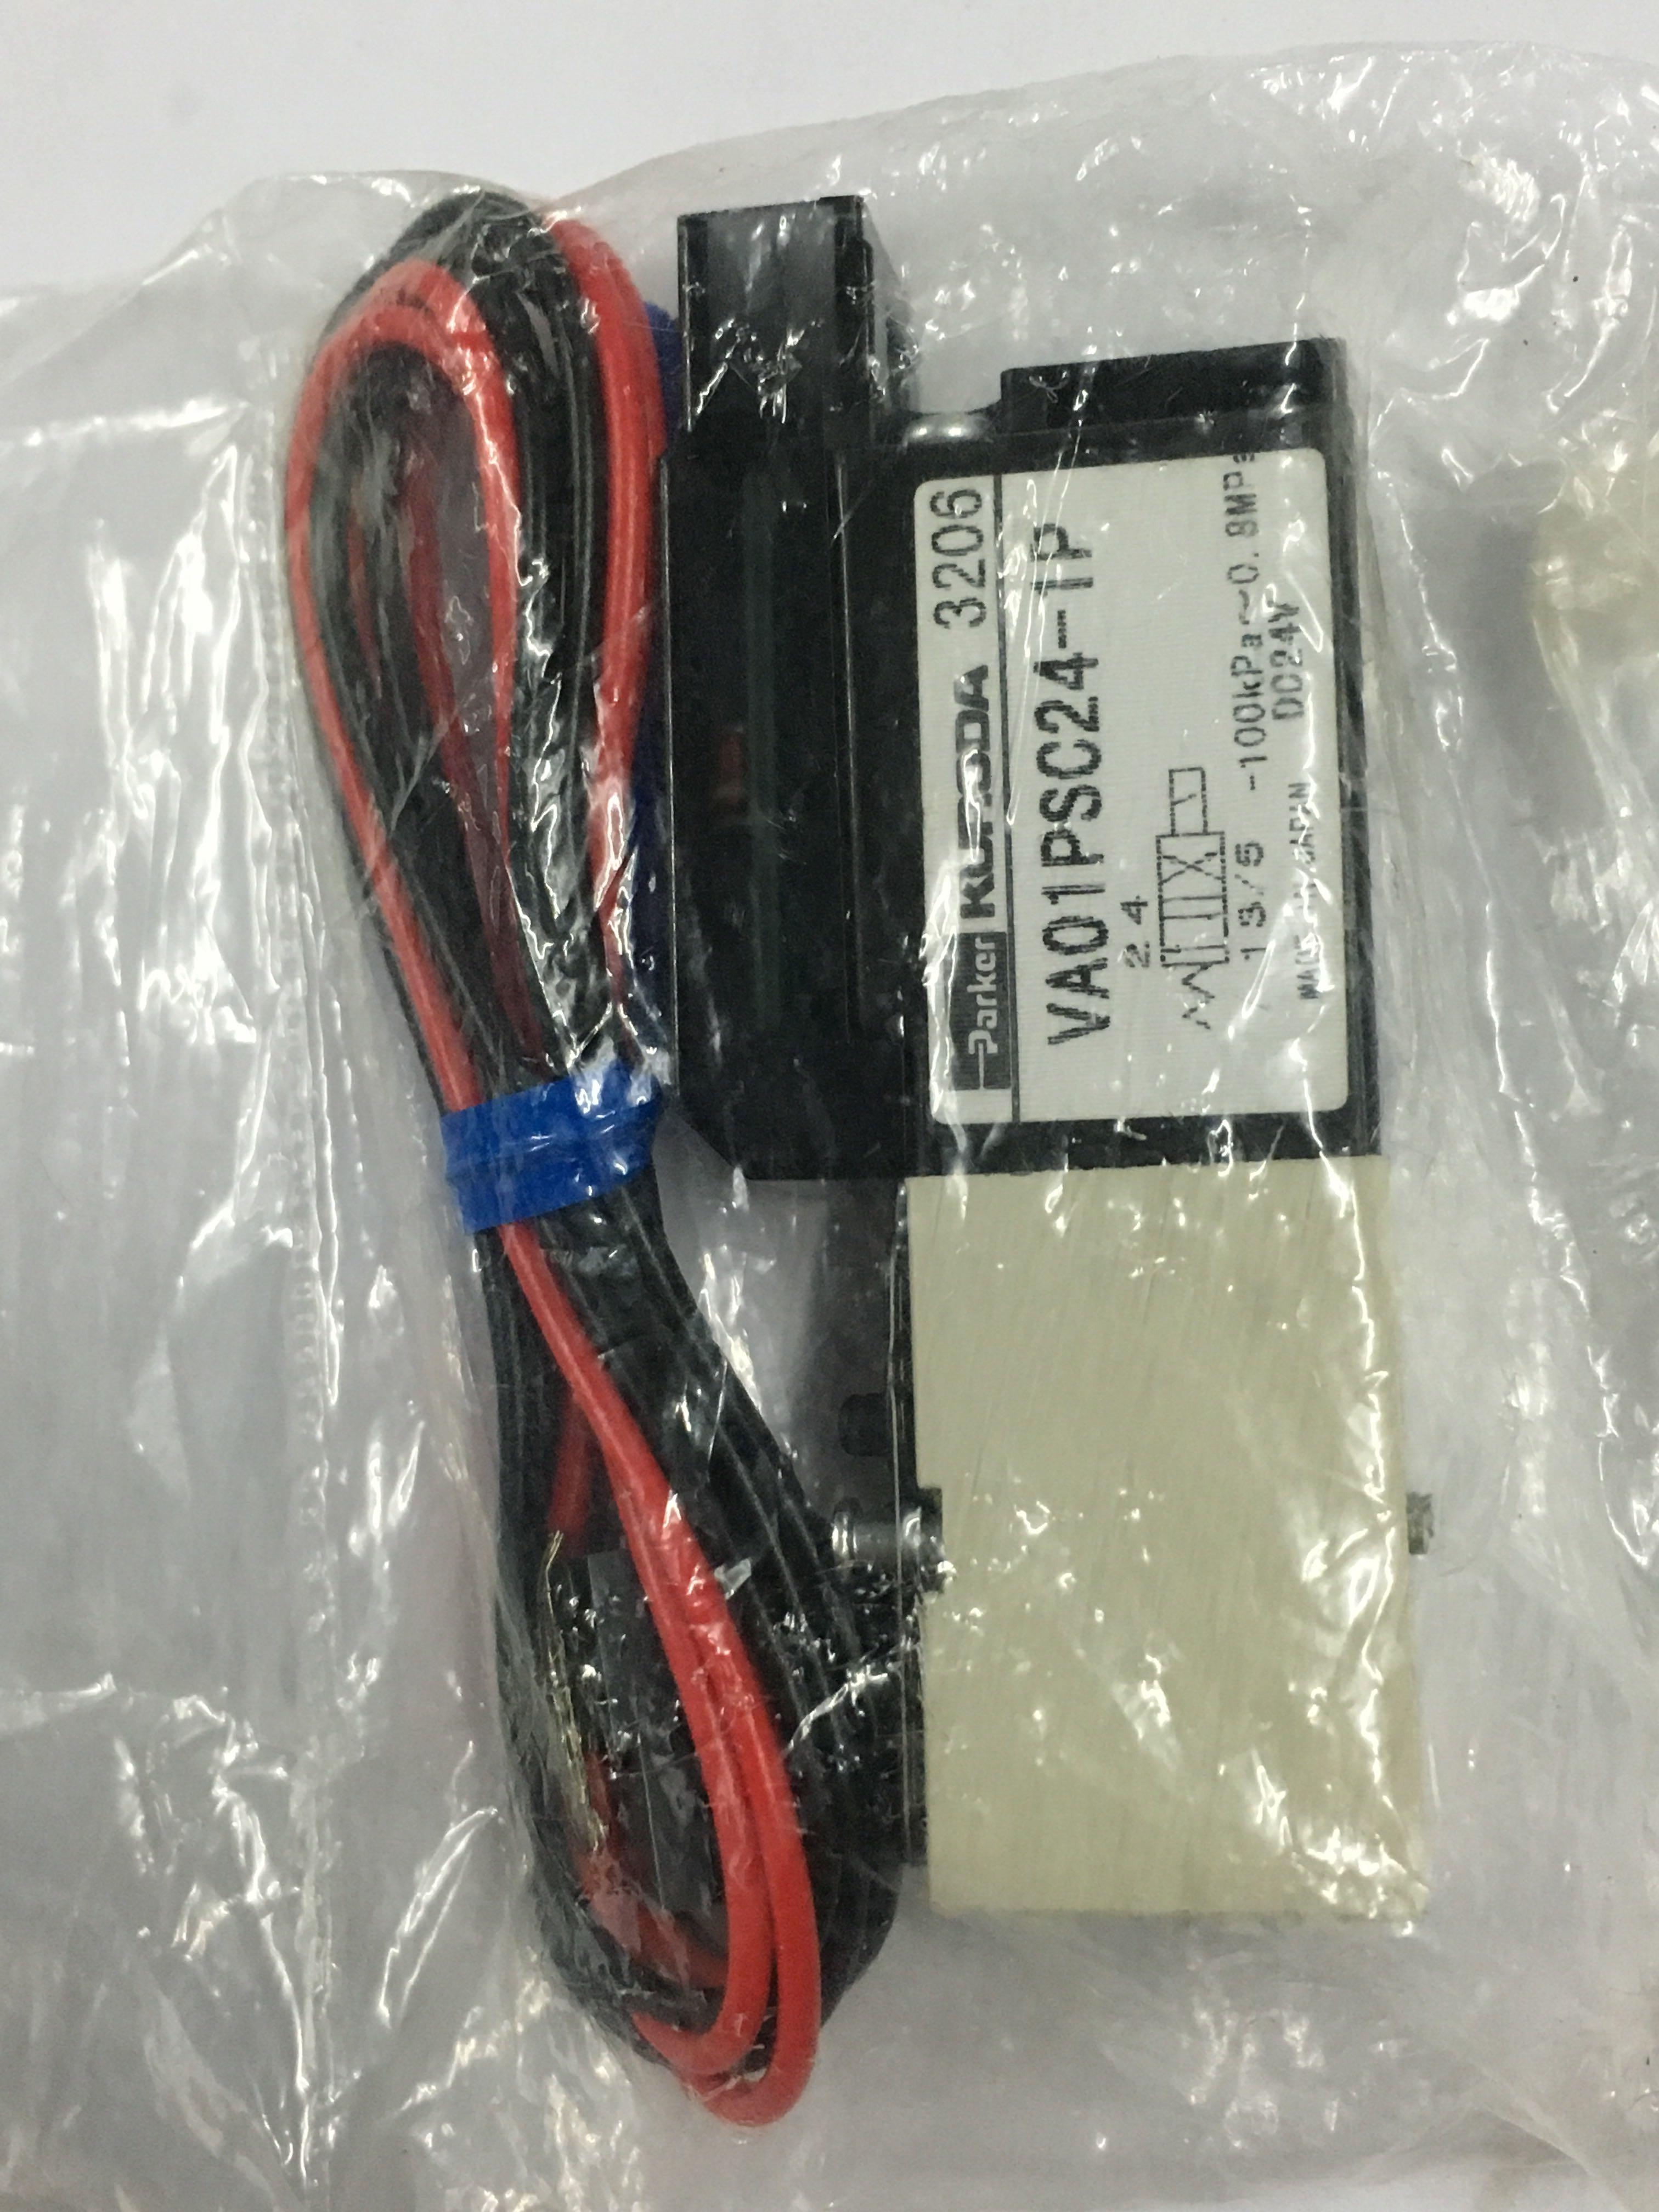 купить VA01PSC24-1P KURODA solenoid valve brand new original authentic по цене 5439.8 рублей